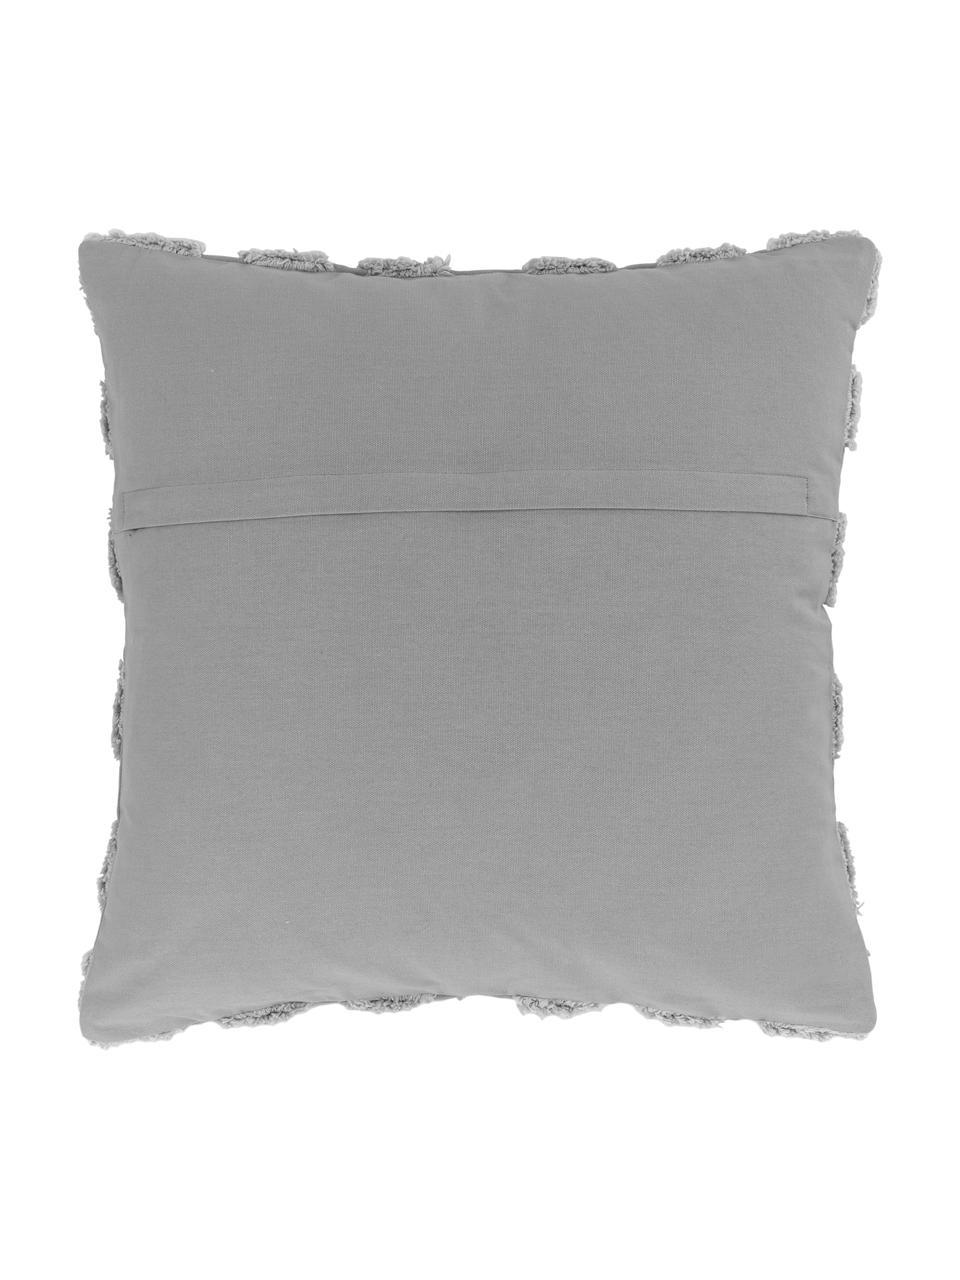 Kissenhülle Kara mit getuftetem Muster, 100% Baumwolle, Grau, 50 x 50 cm